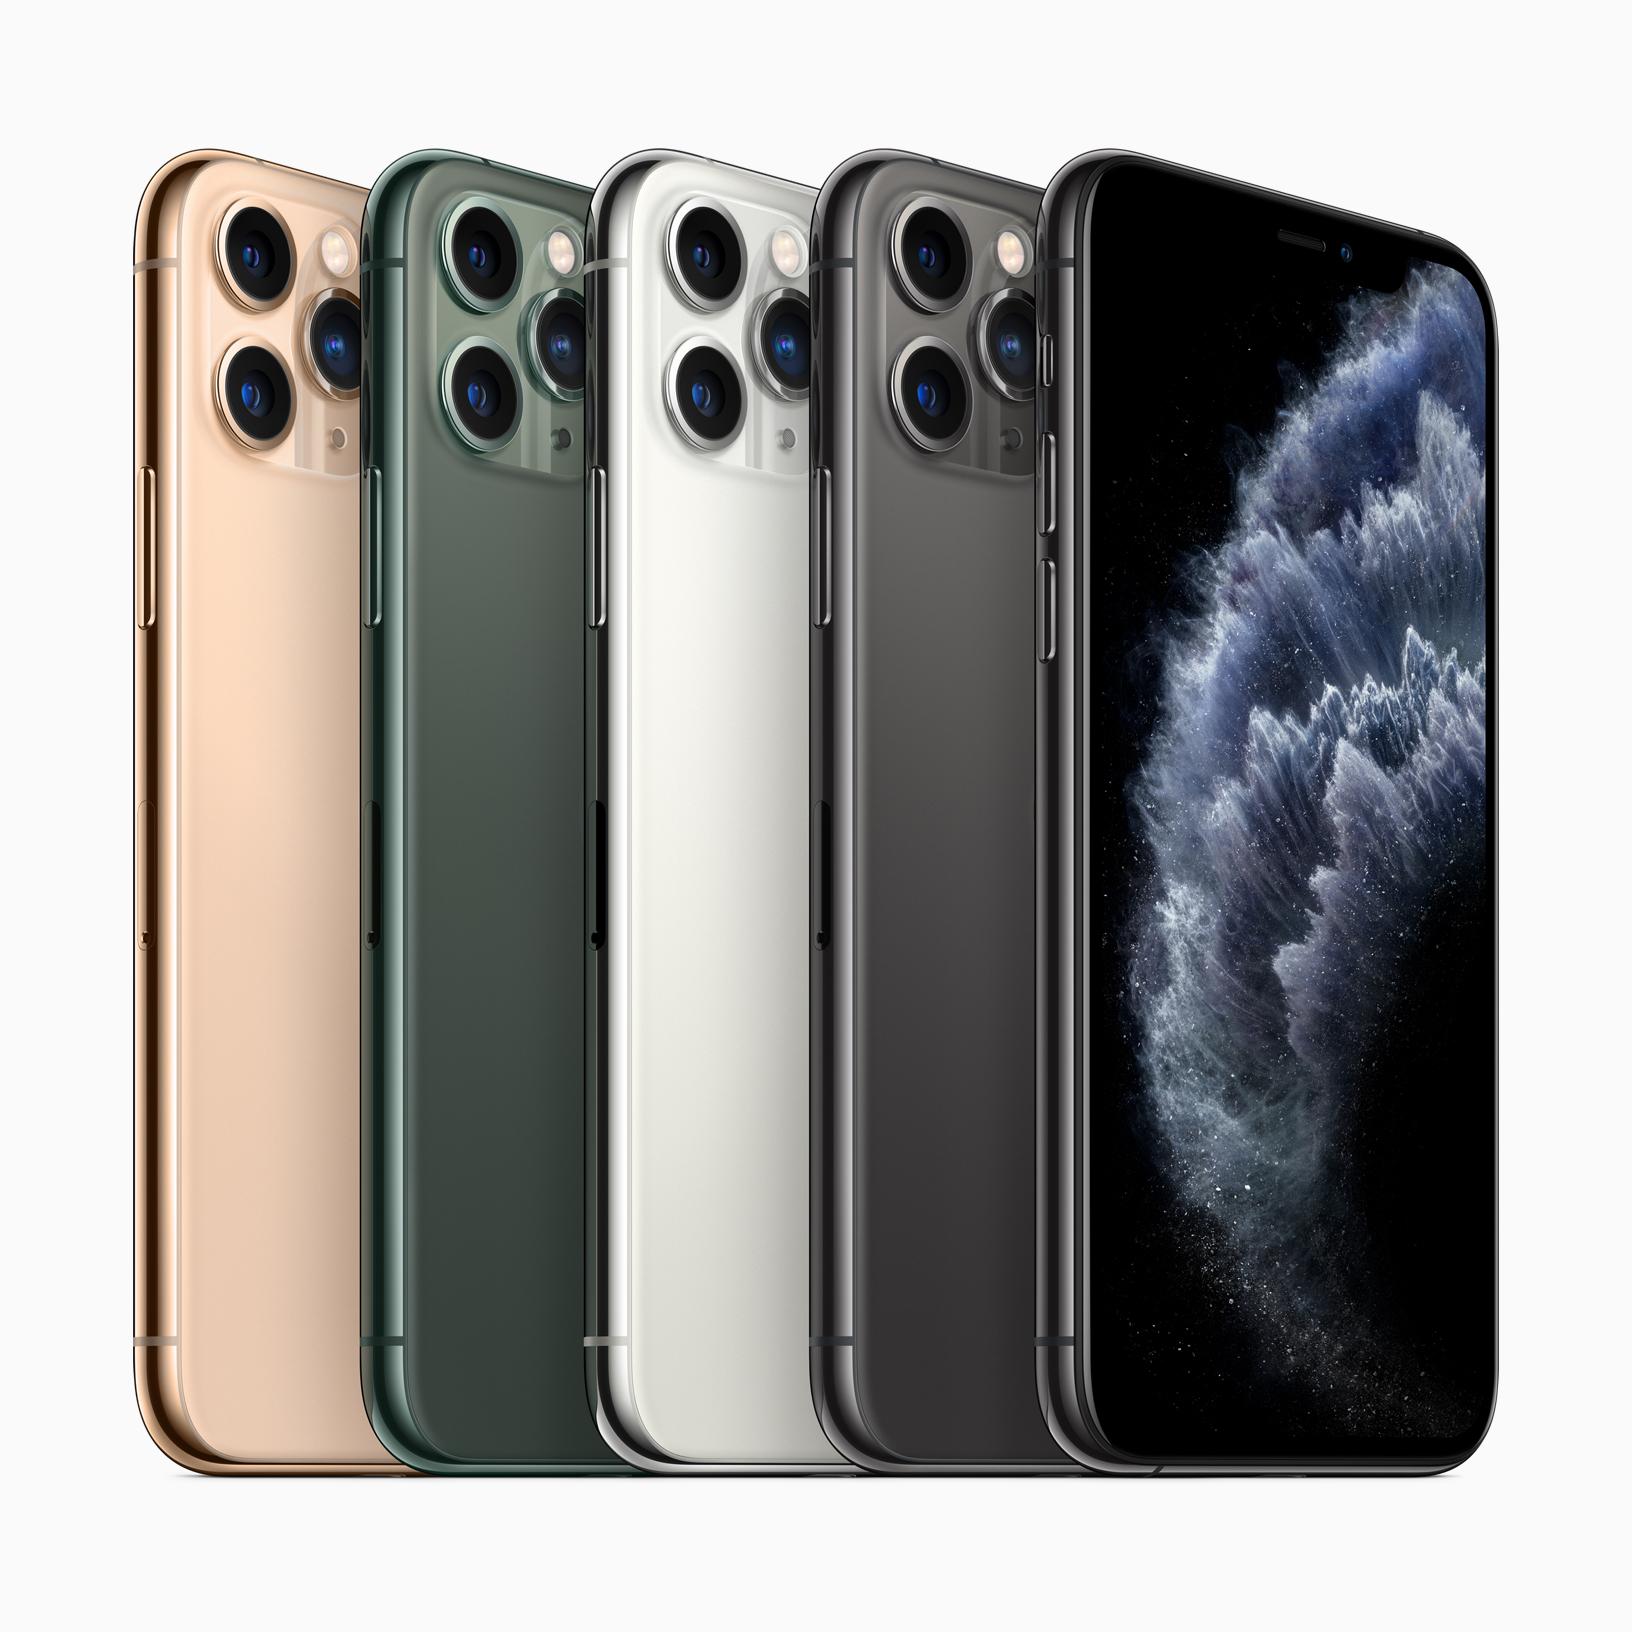 Apple_iPhone-11-Pro_Colors_091019_big.jpg.large_2x.jpg